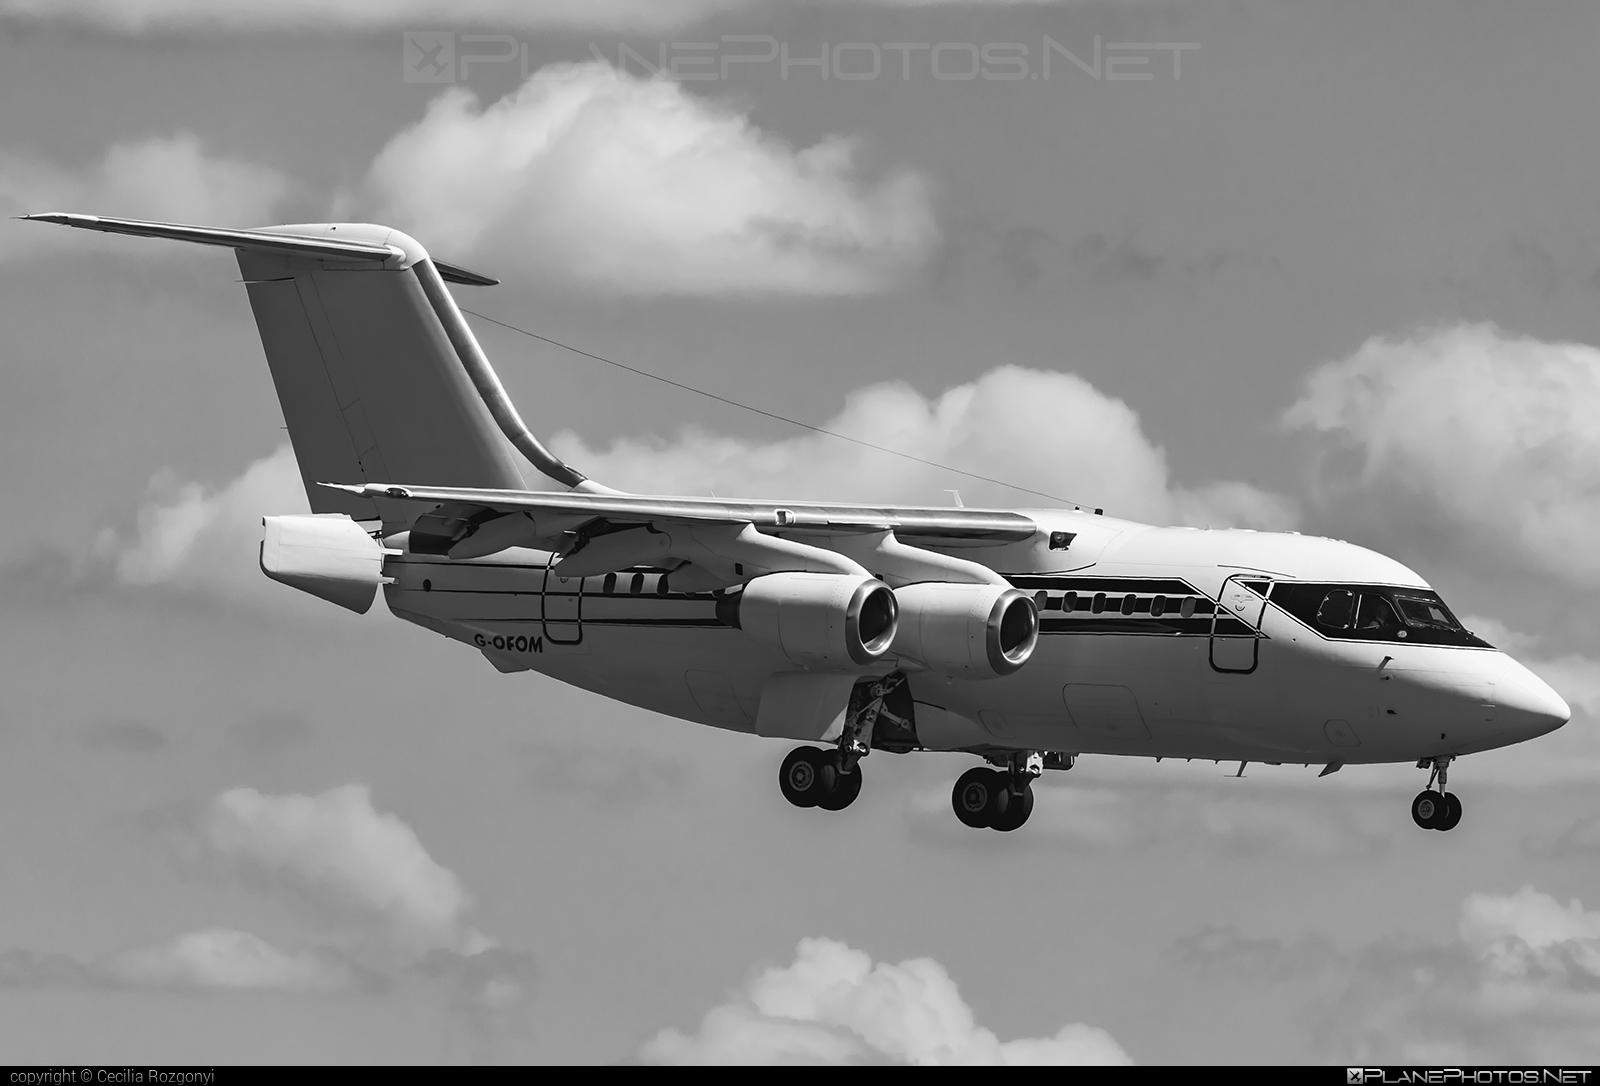 British Aerospace BAe 146-100 - G-OFOM operated by Formula One Management Ltd #bae146 #bae146100 #britishaerospace #formulaonemanagement